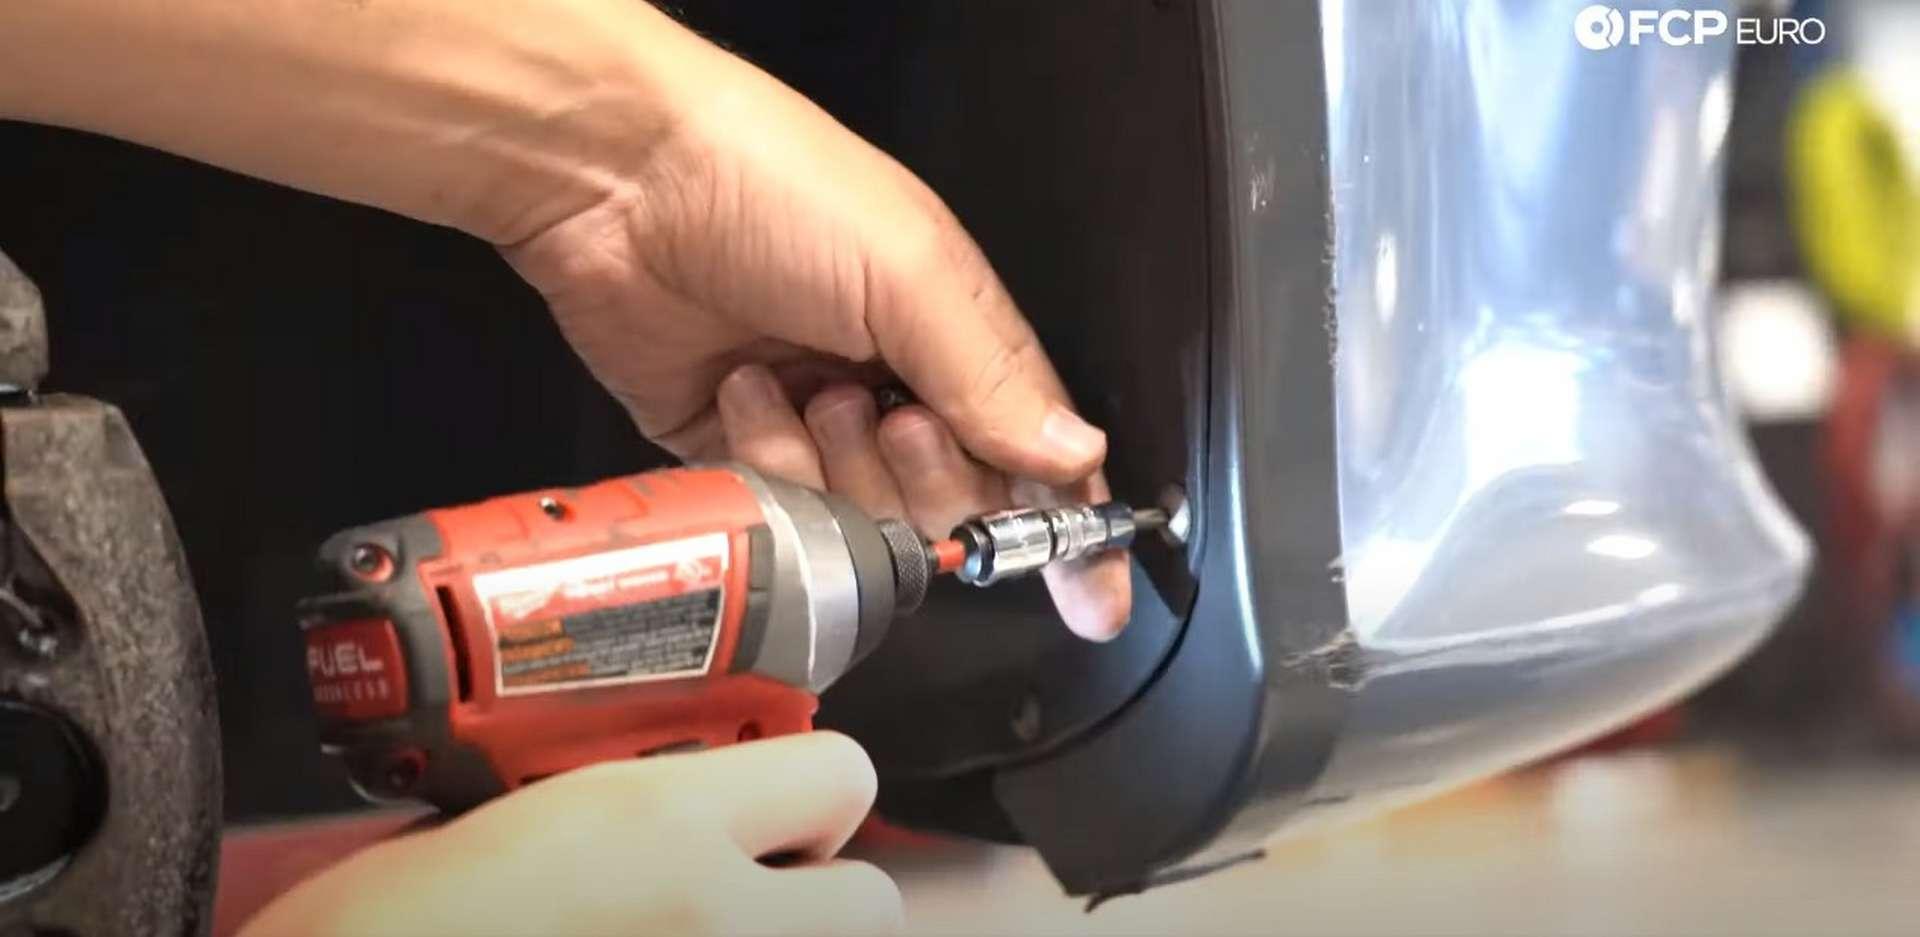 DIY Volvo Alternator and Serpentine Belt Replacement removing the fender liner fasteners